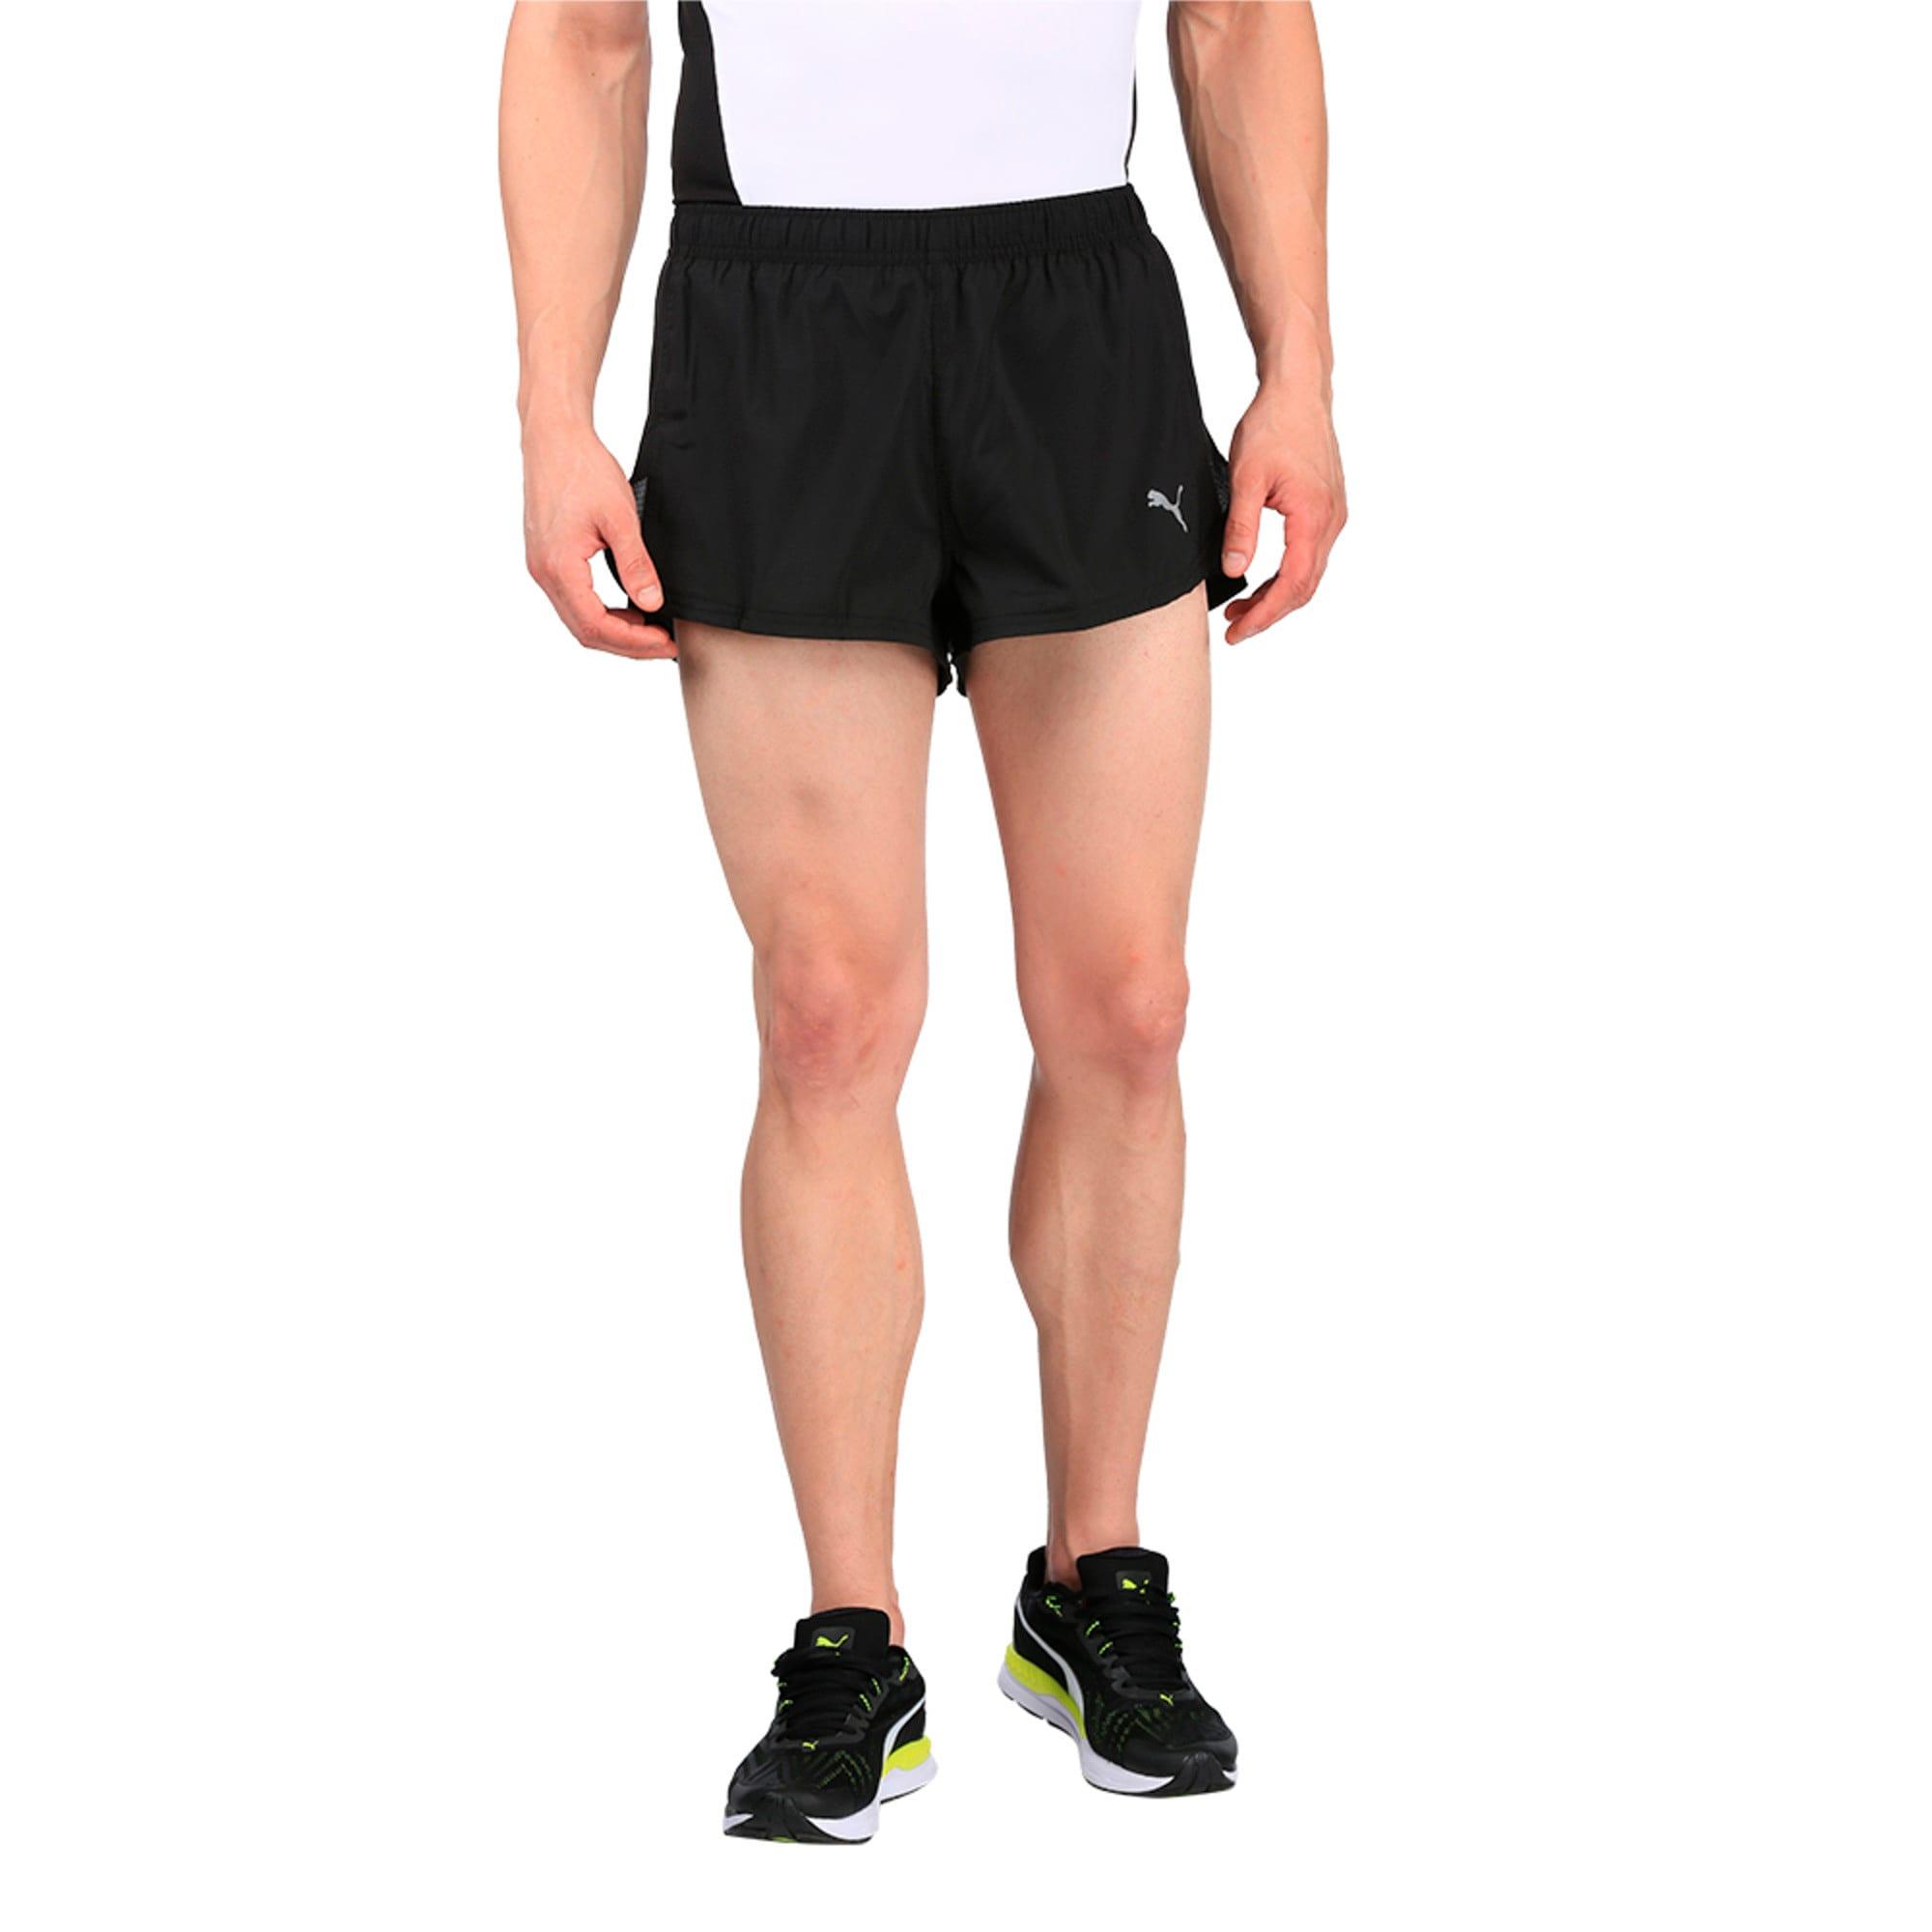 Thumbnail 1 of Running Men's Split Shorts, Puma Black, medium-IND